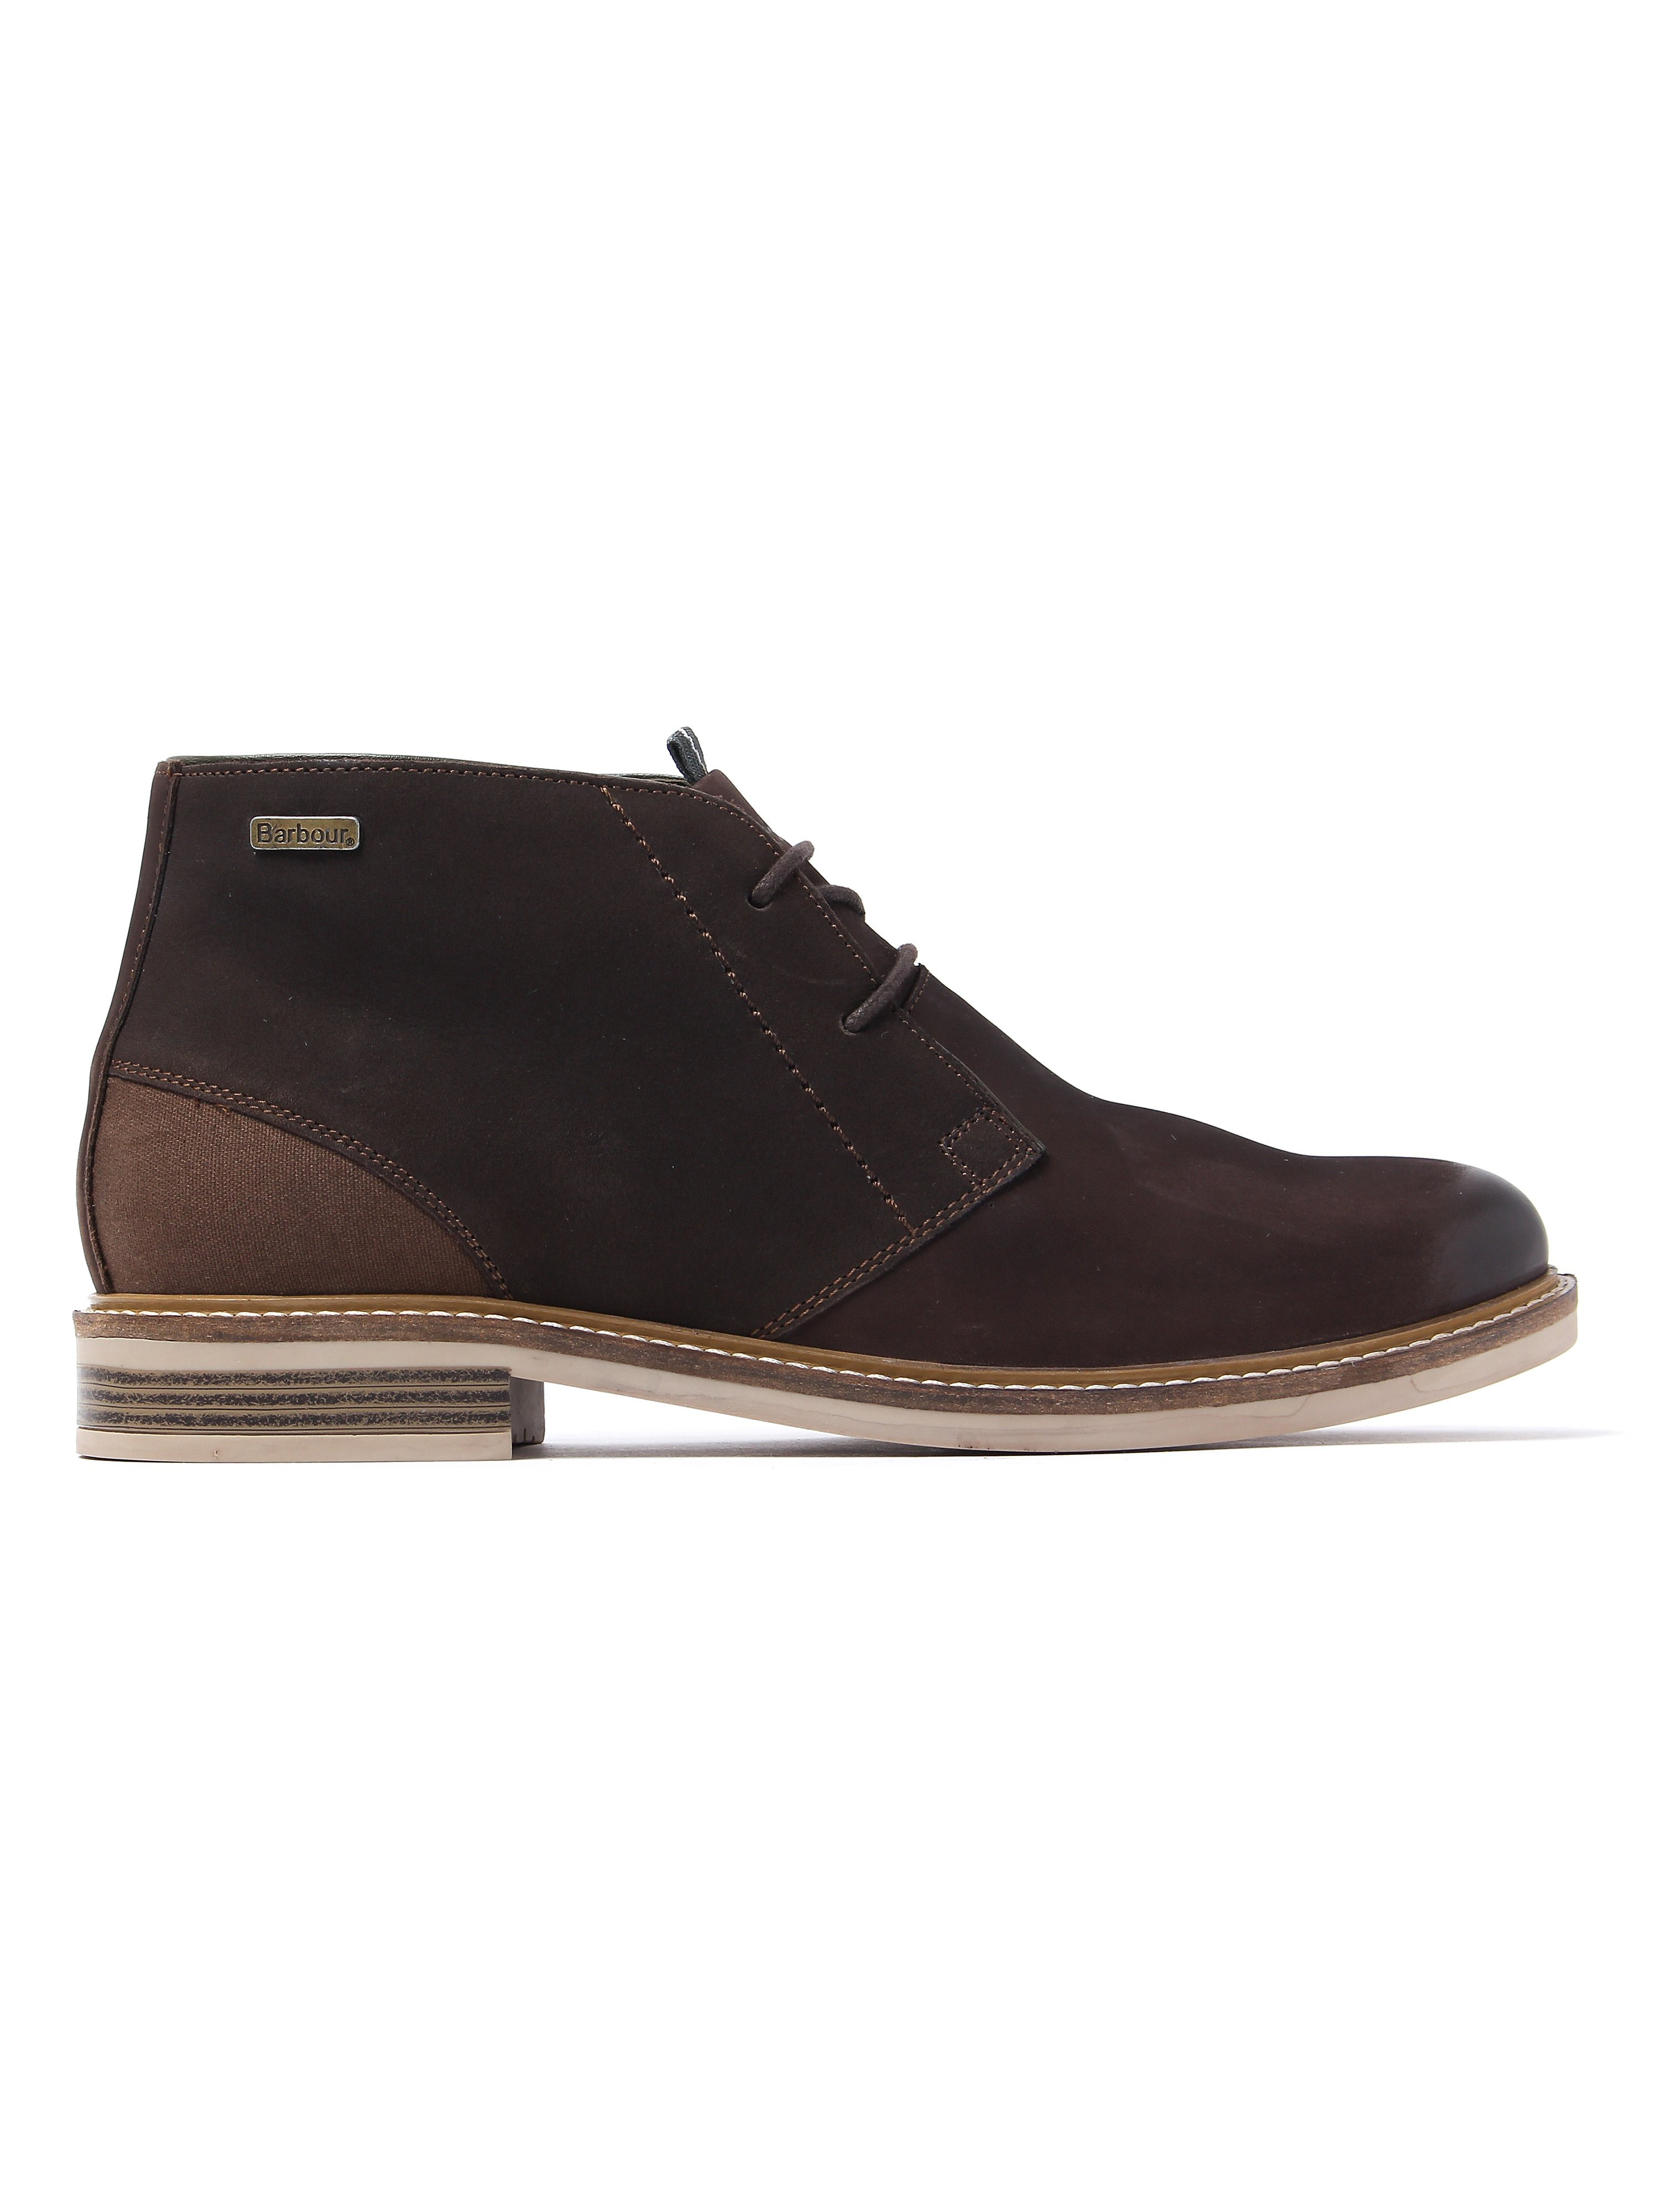 Barbour Men's Readhead Chukka Boots - Light Dark Brown Nubuck